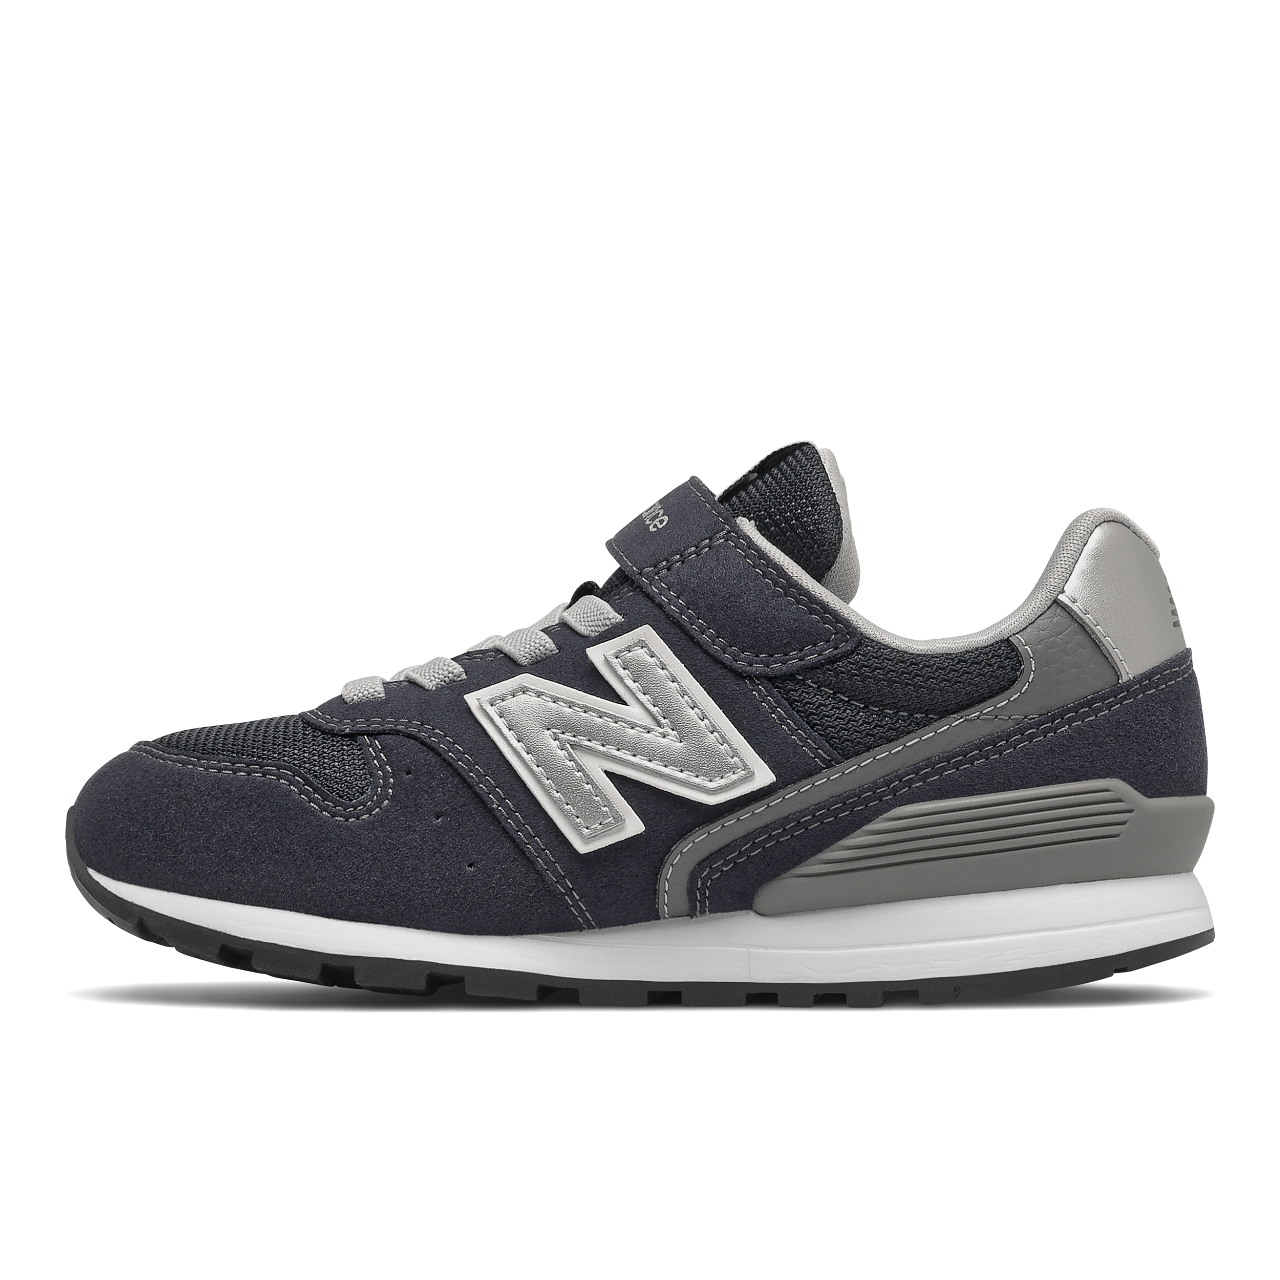 New Balance YV996NV3 Sneakers, Navy, 35